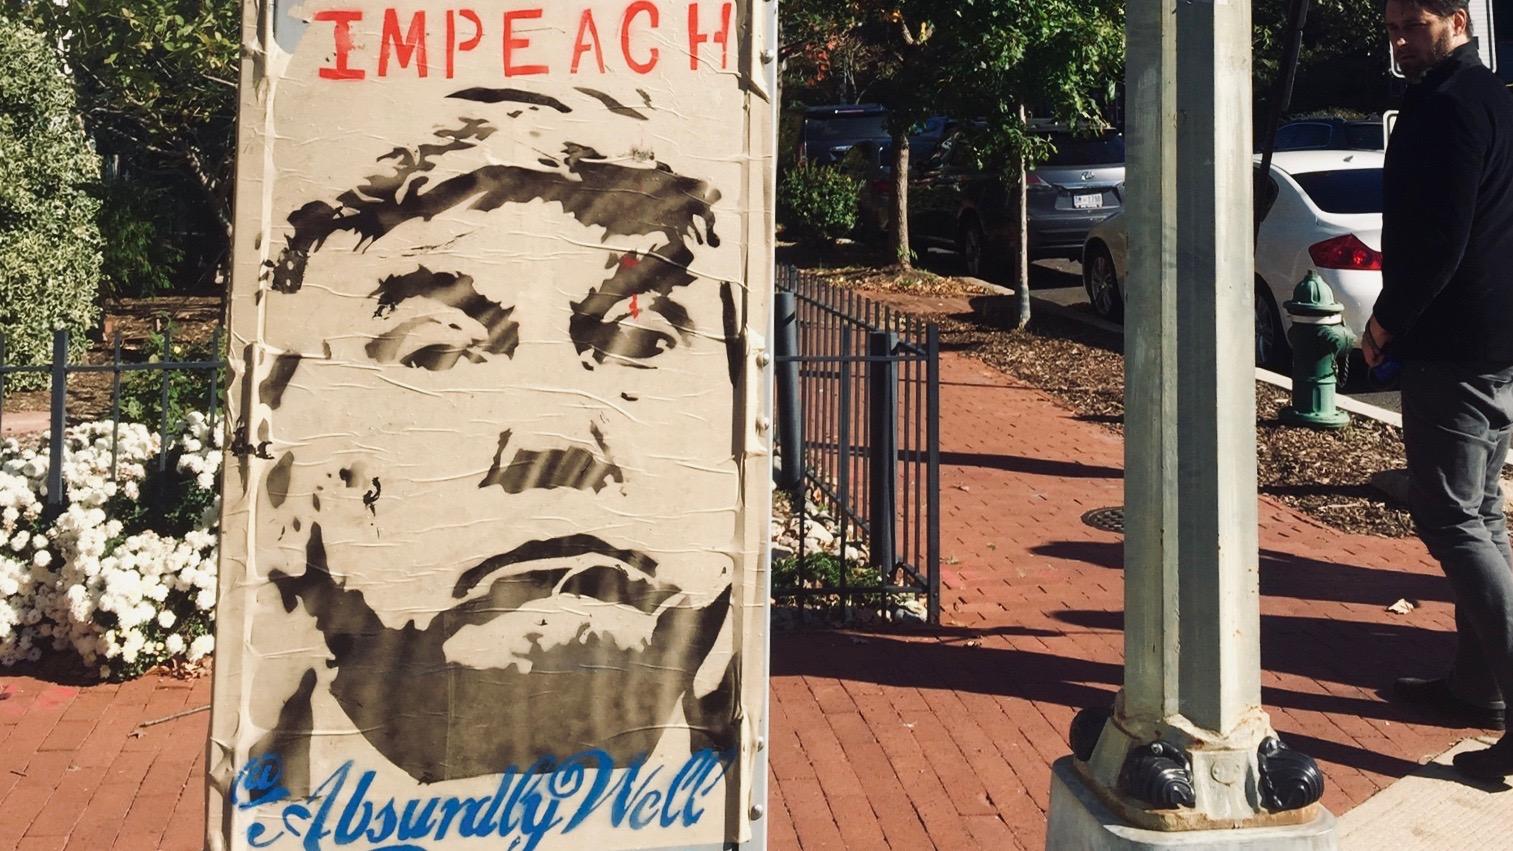 impeach trump sign in washington, dc